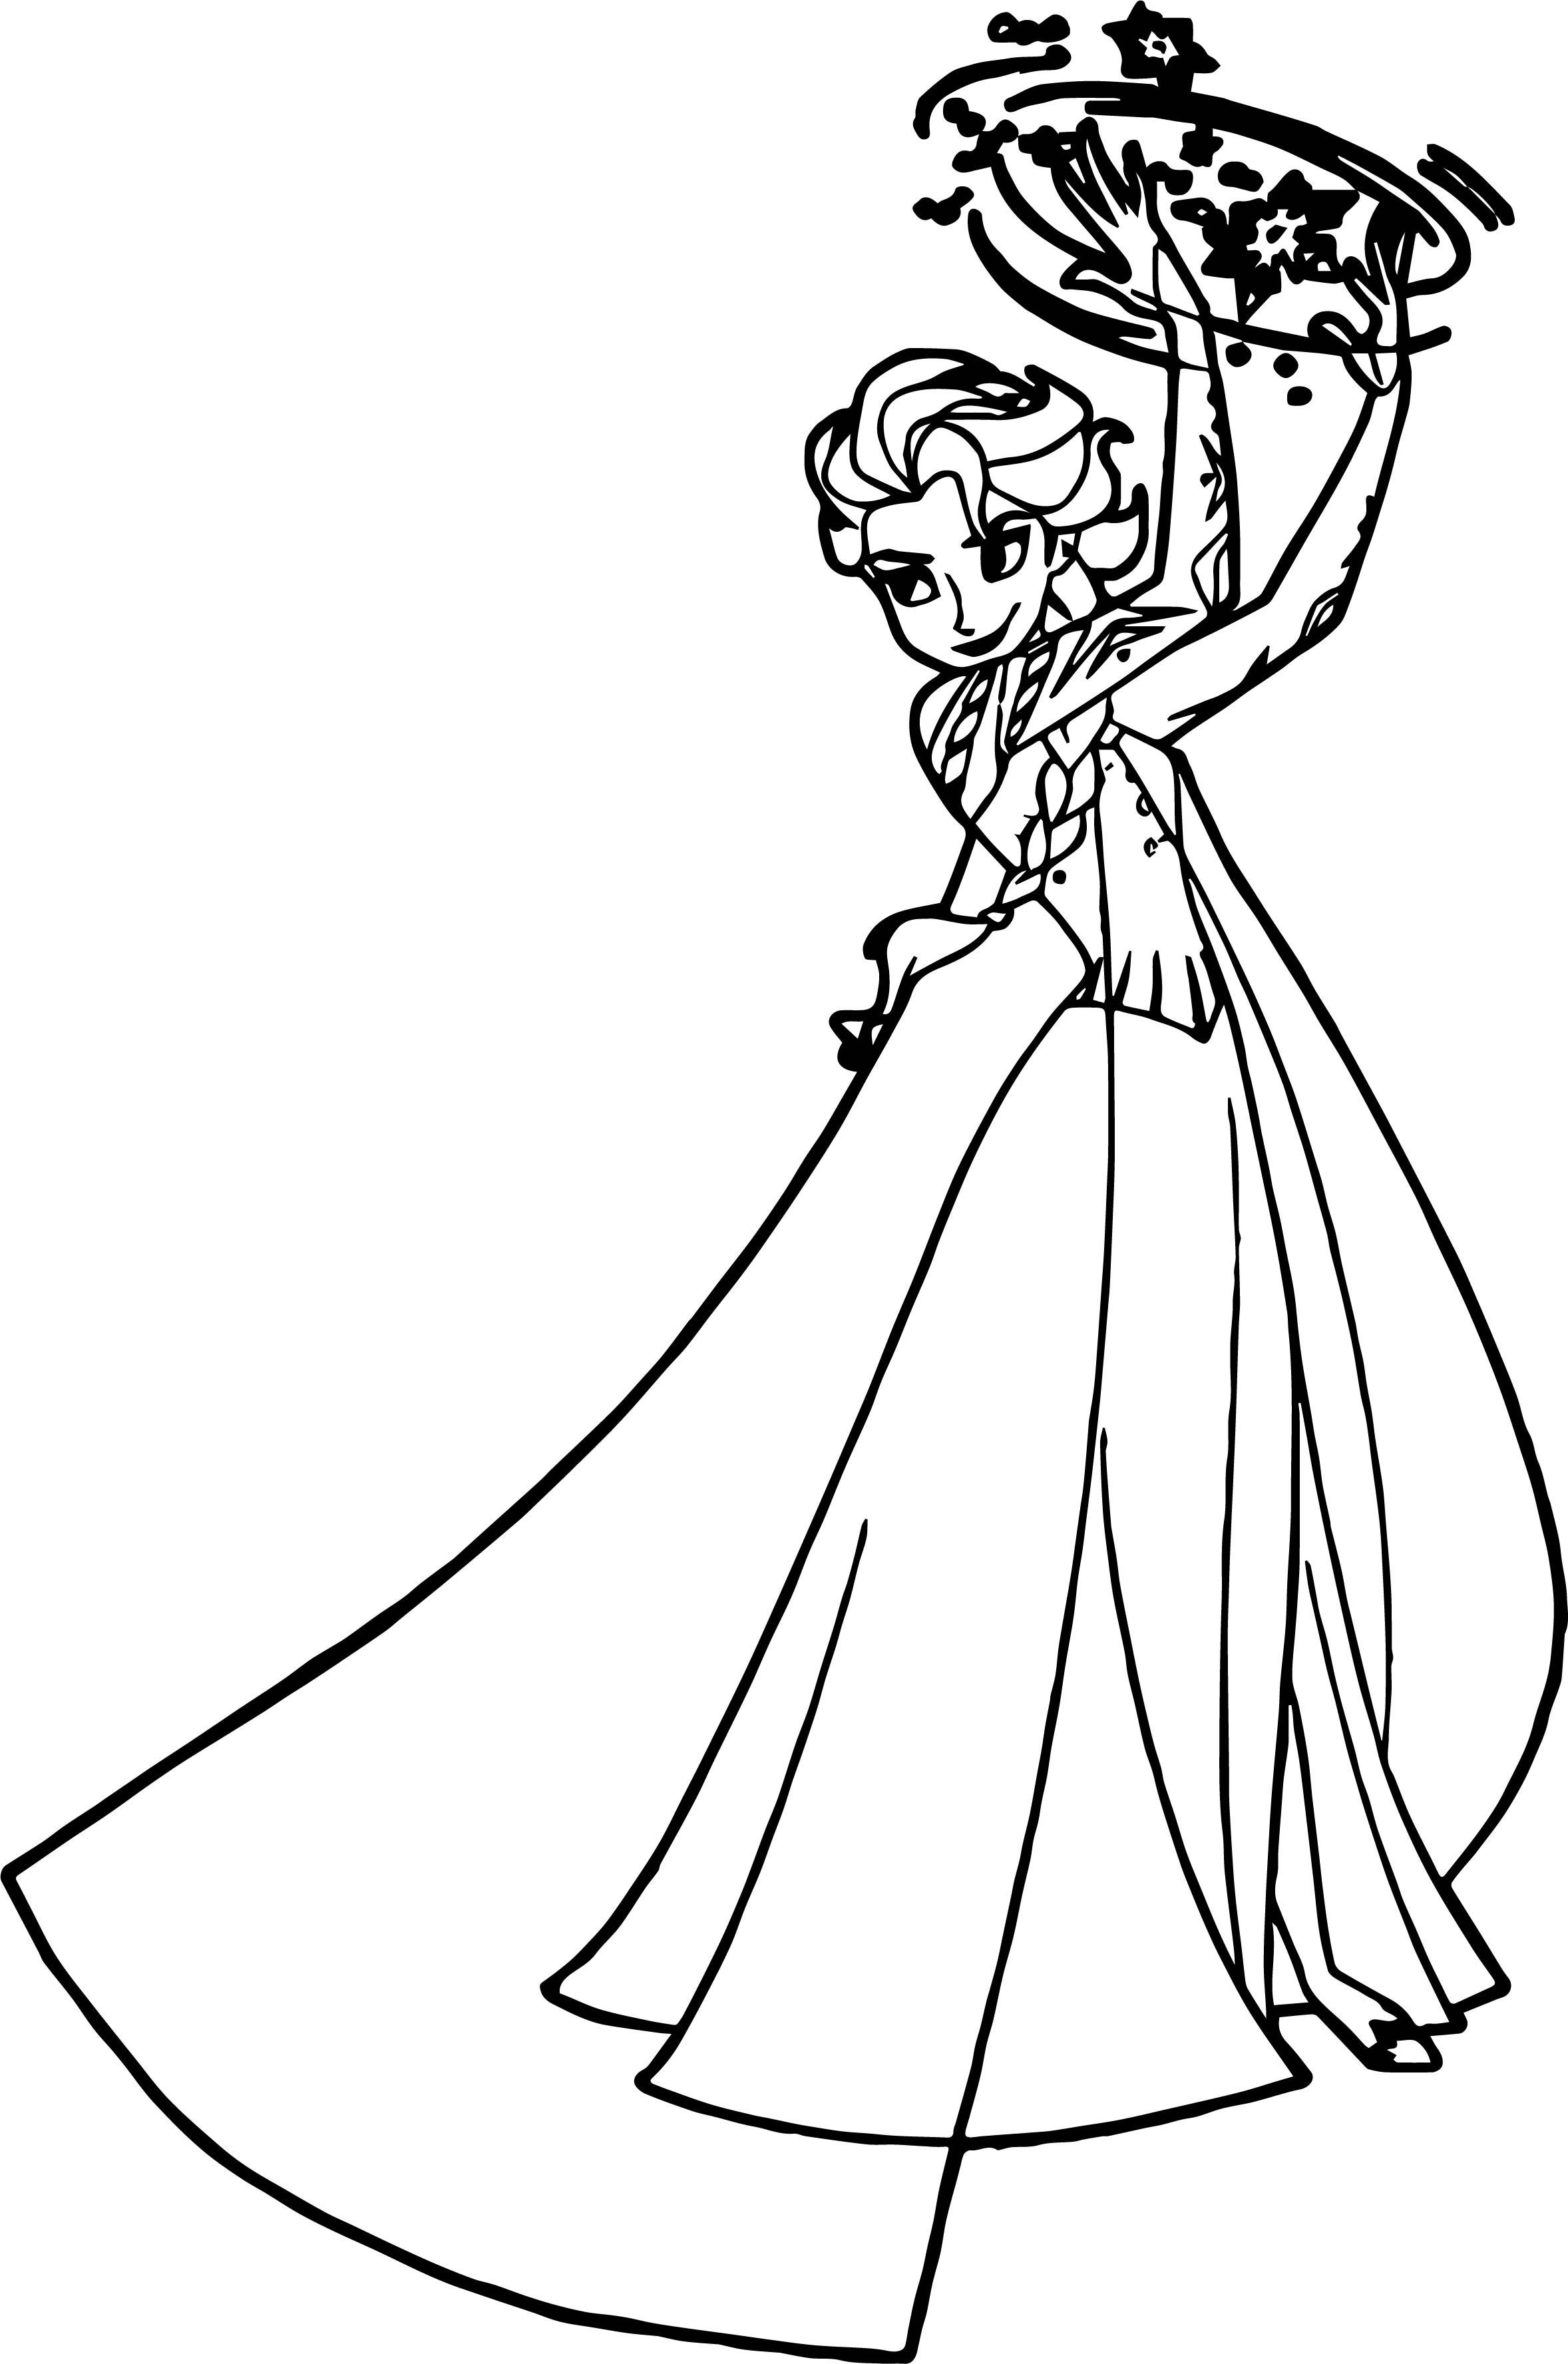 Elsa Magic Time Coloring Page